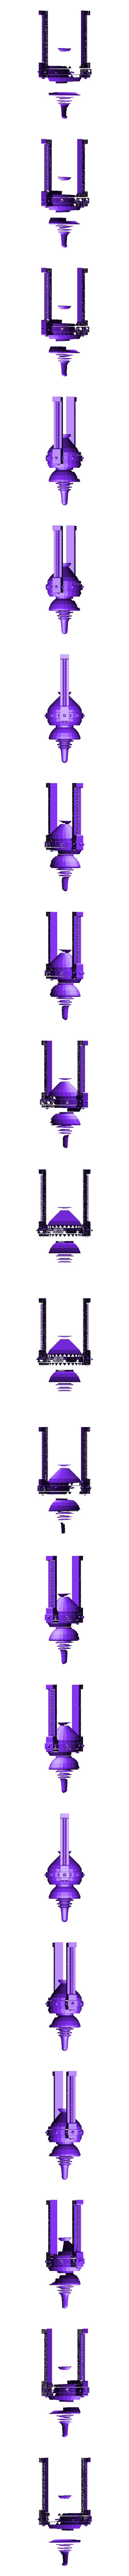 c-beamer-barrel-sort-of.stl Download free STL file Guardian Armor Conversion Inator • 3D printable model, PeCeT